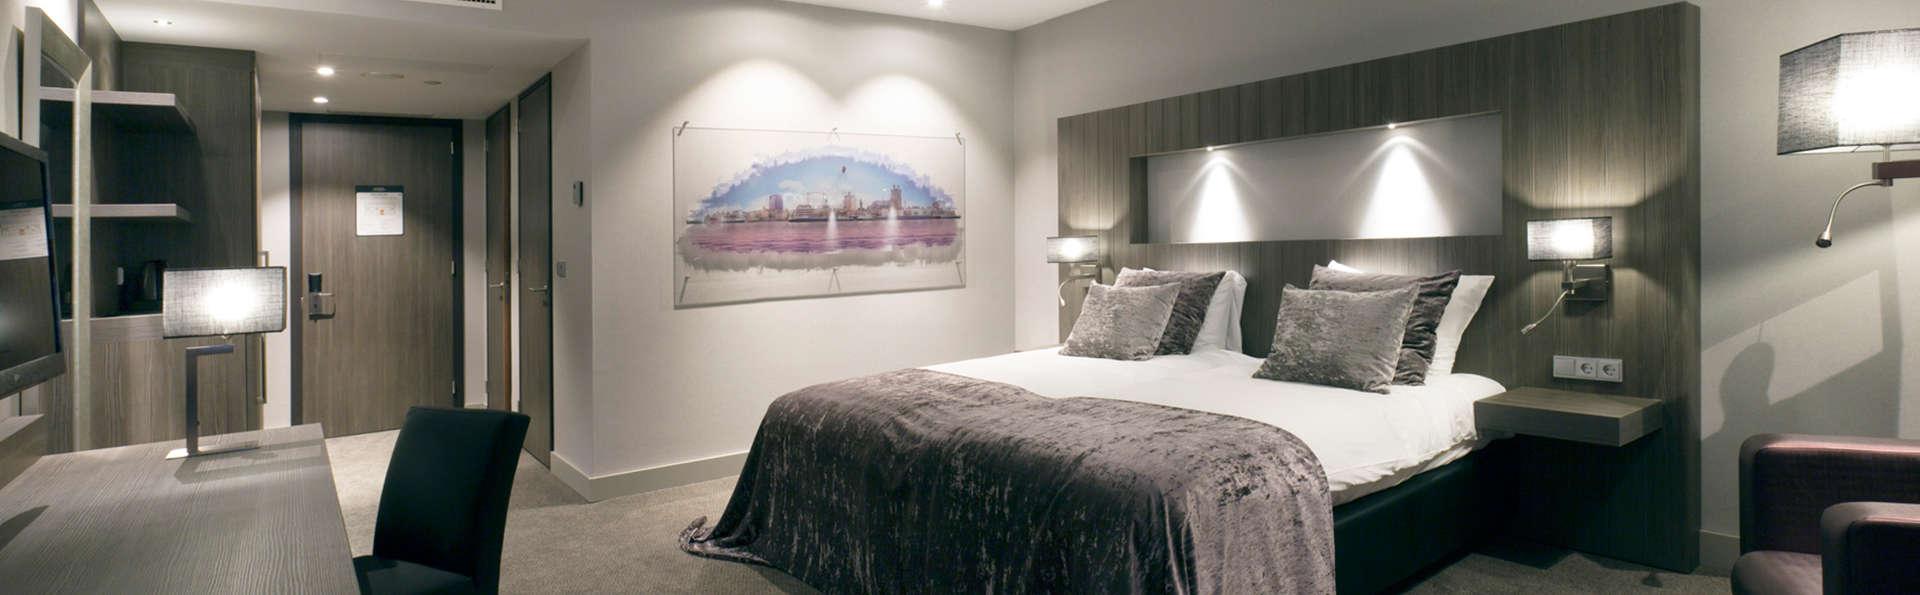 Van der Valk hotel Dordrecht - edit_room1_-_Copy.jpg